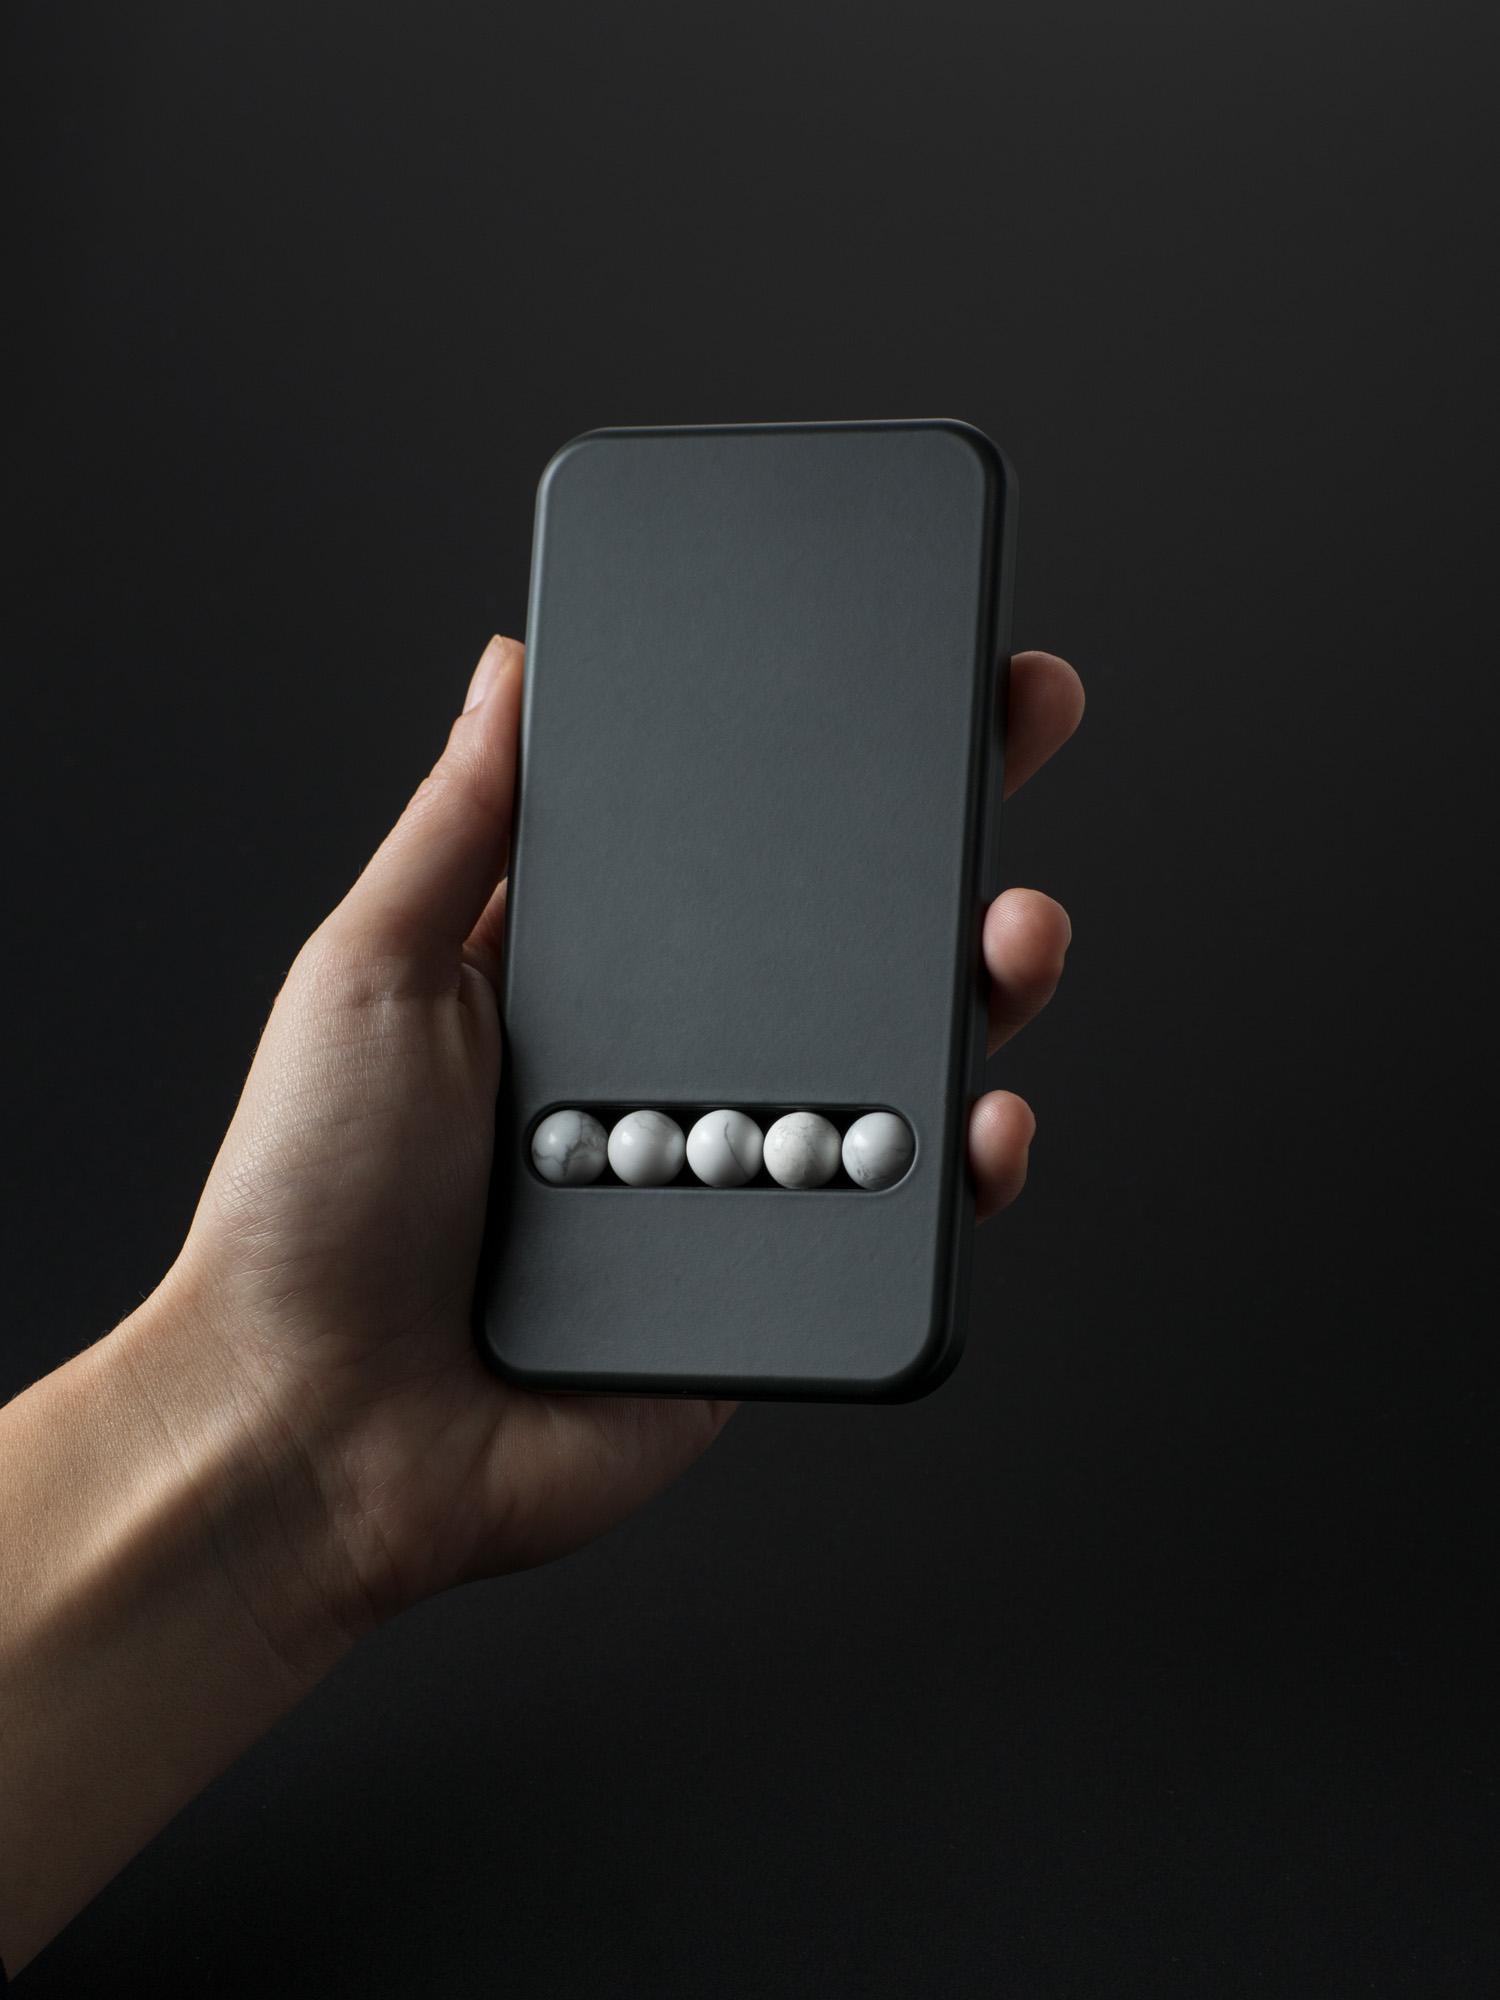 Teléfono sustituto